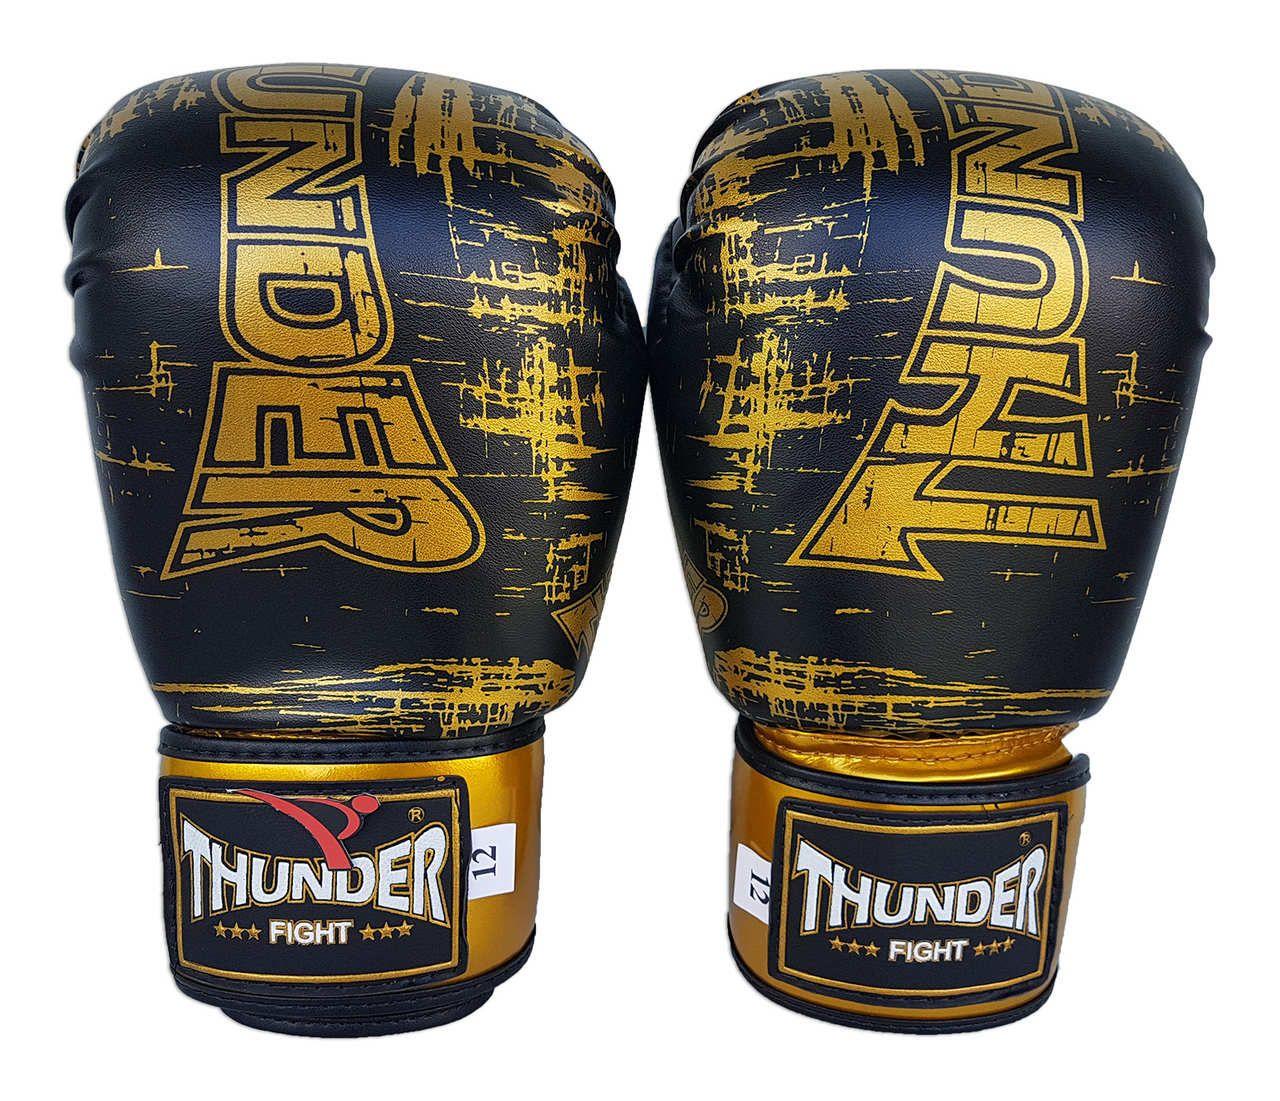 Luva de Boxe / Muay Thai 10oz - Preto Riscado - Thunder Fight  - PRALUTA SHOP